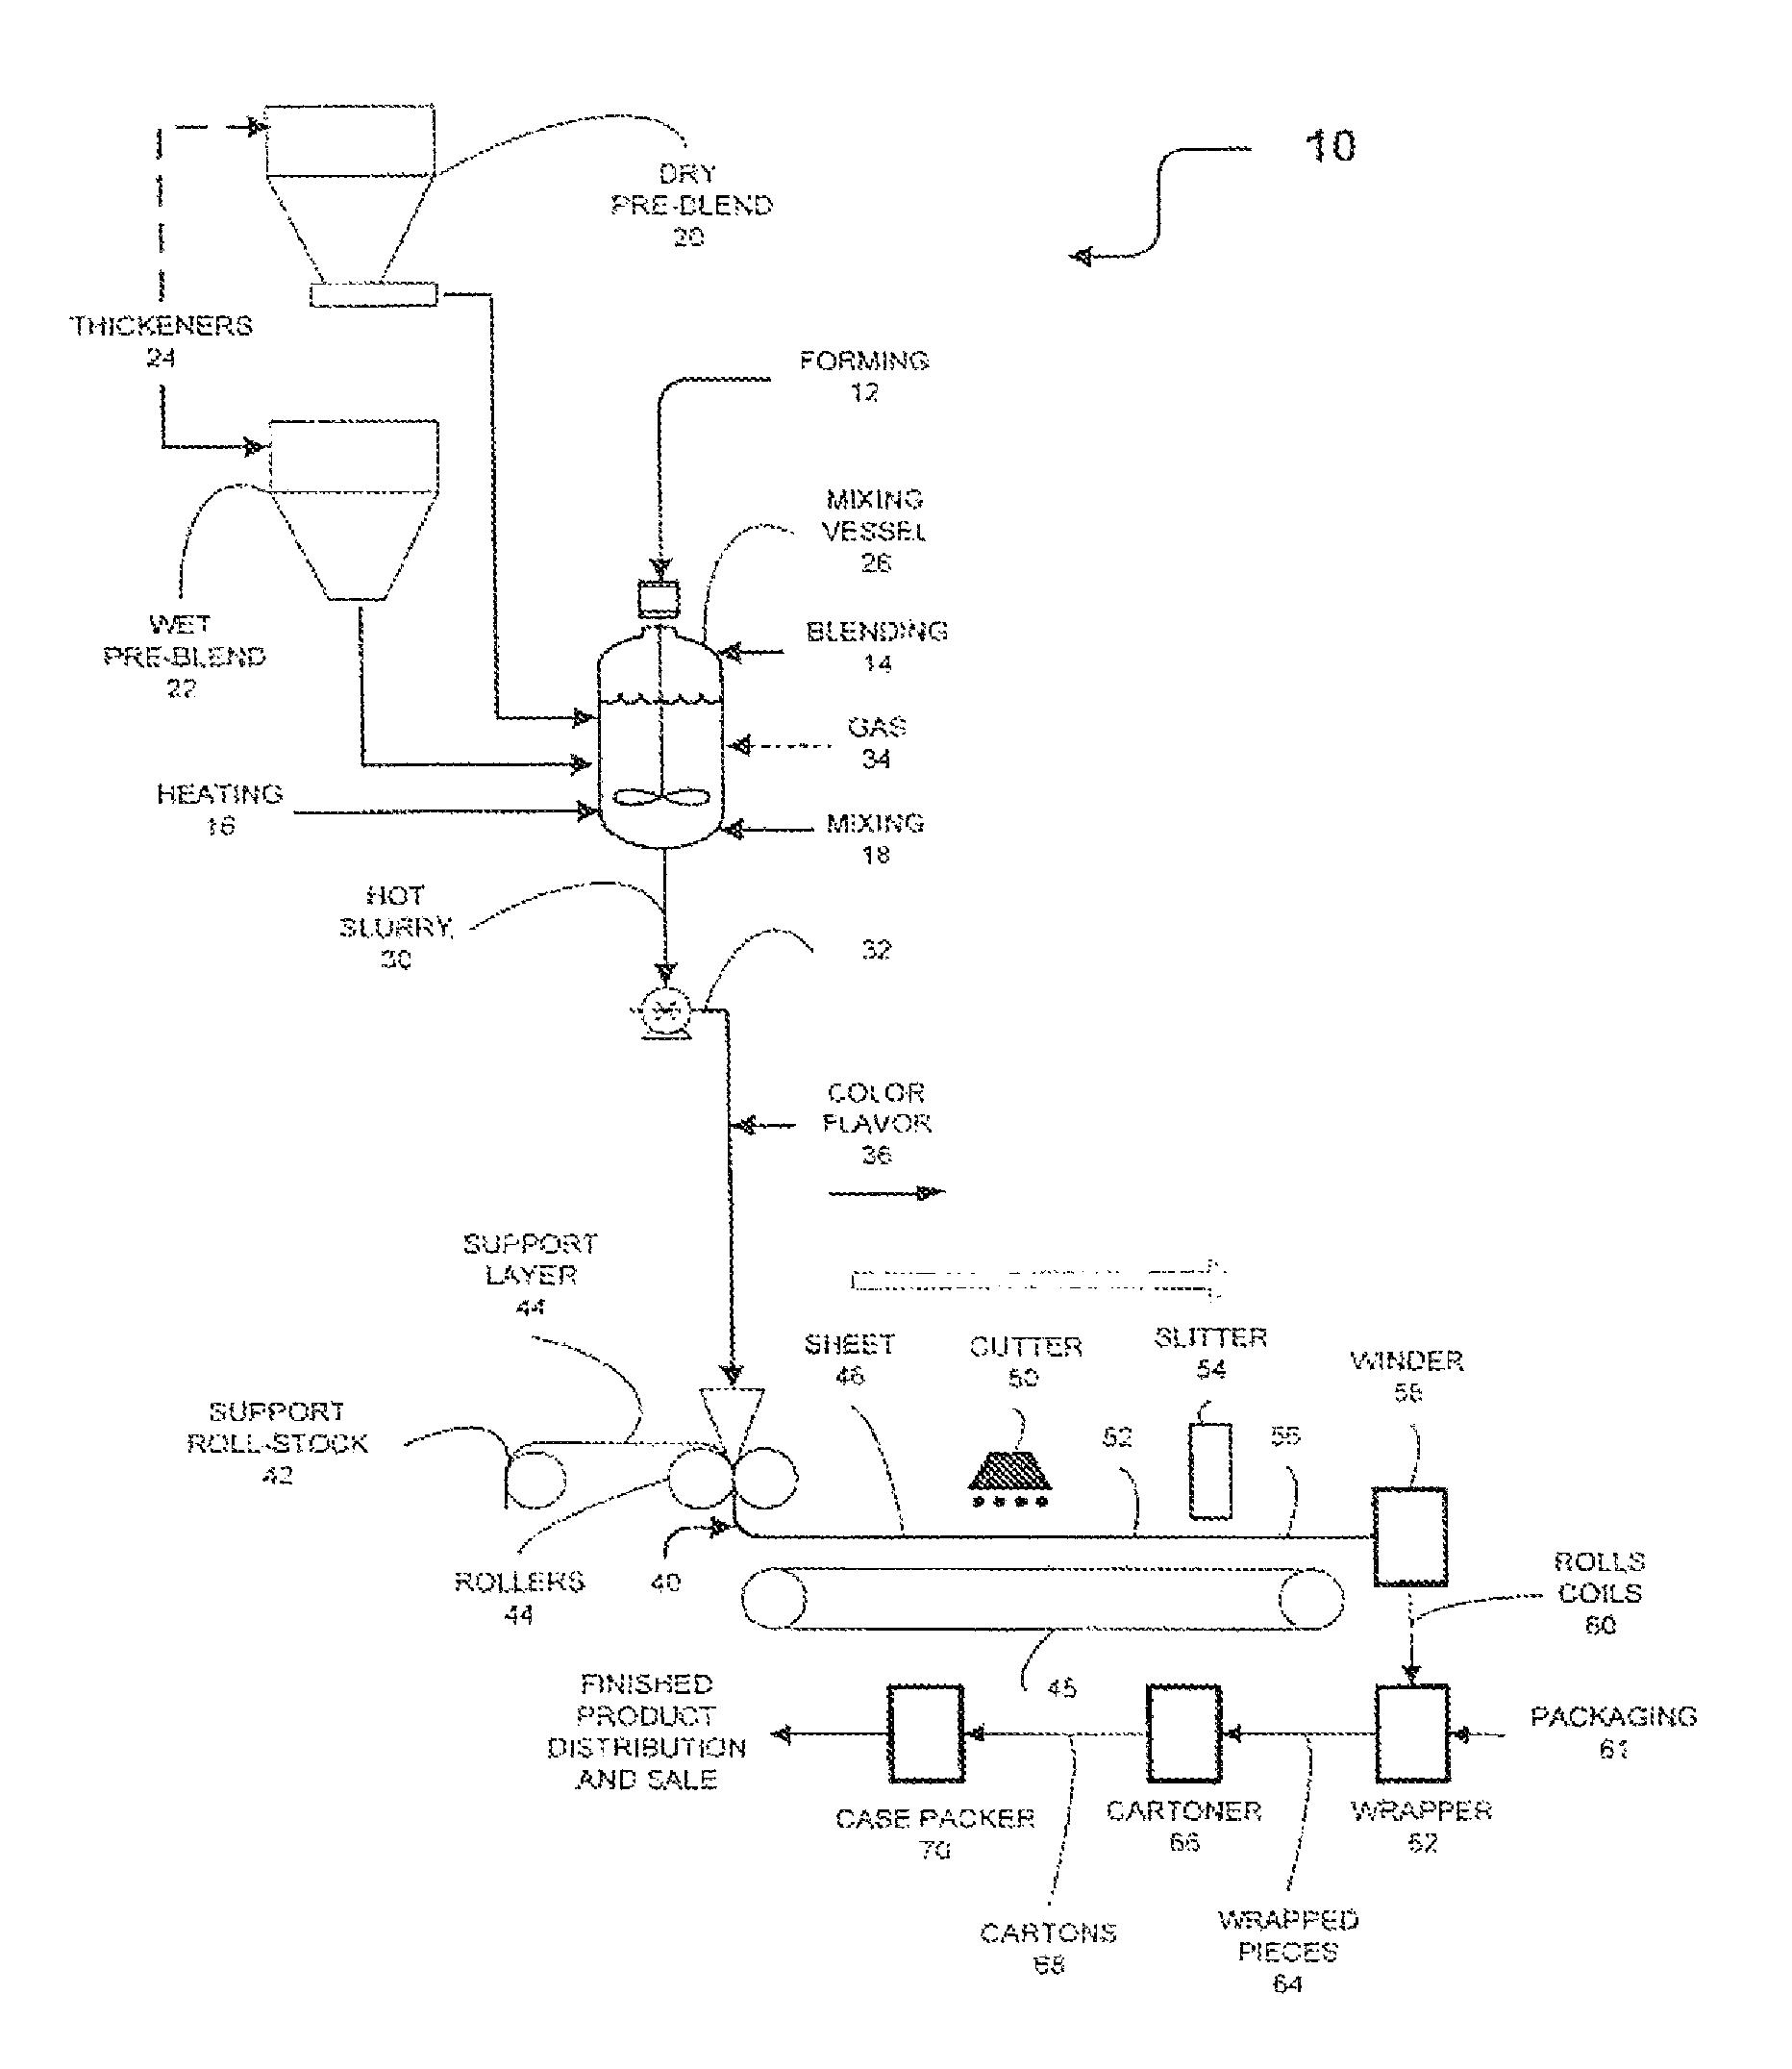 process flow diagram national cranberry cooperative 20 krw lindaprocess flow diagram national cranberry cooperative schematic diagram rh 156 wihado de national cranberry ocean spray